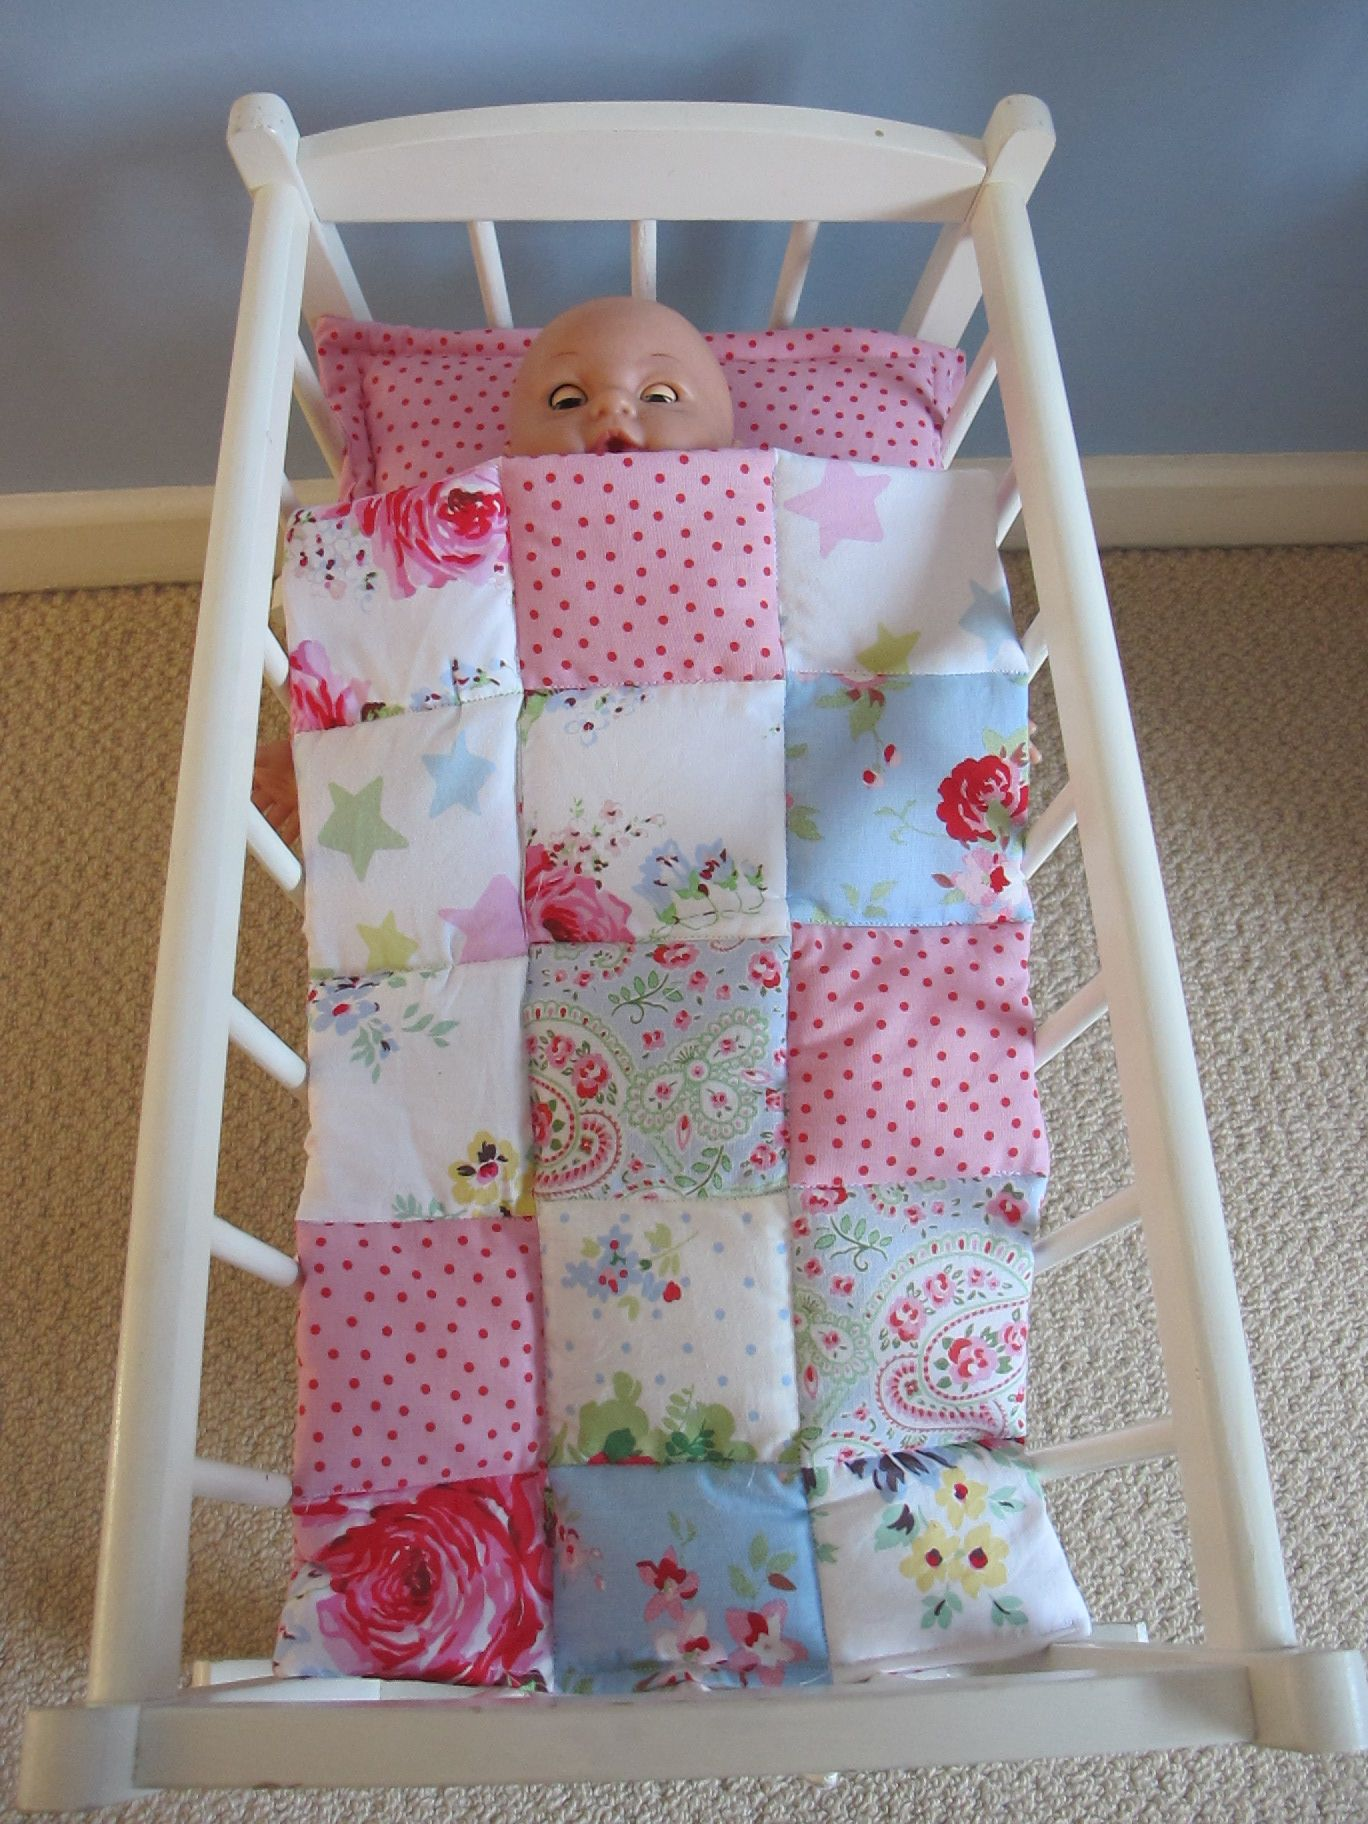 Dolls Cot Or Crib Bedding Patchwork Eiderdown Doll Beds